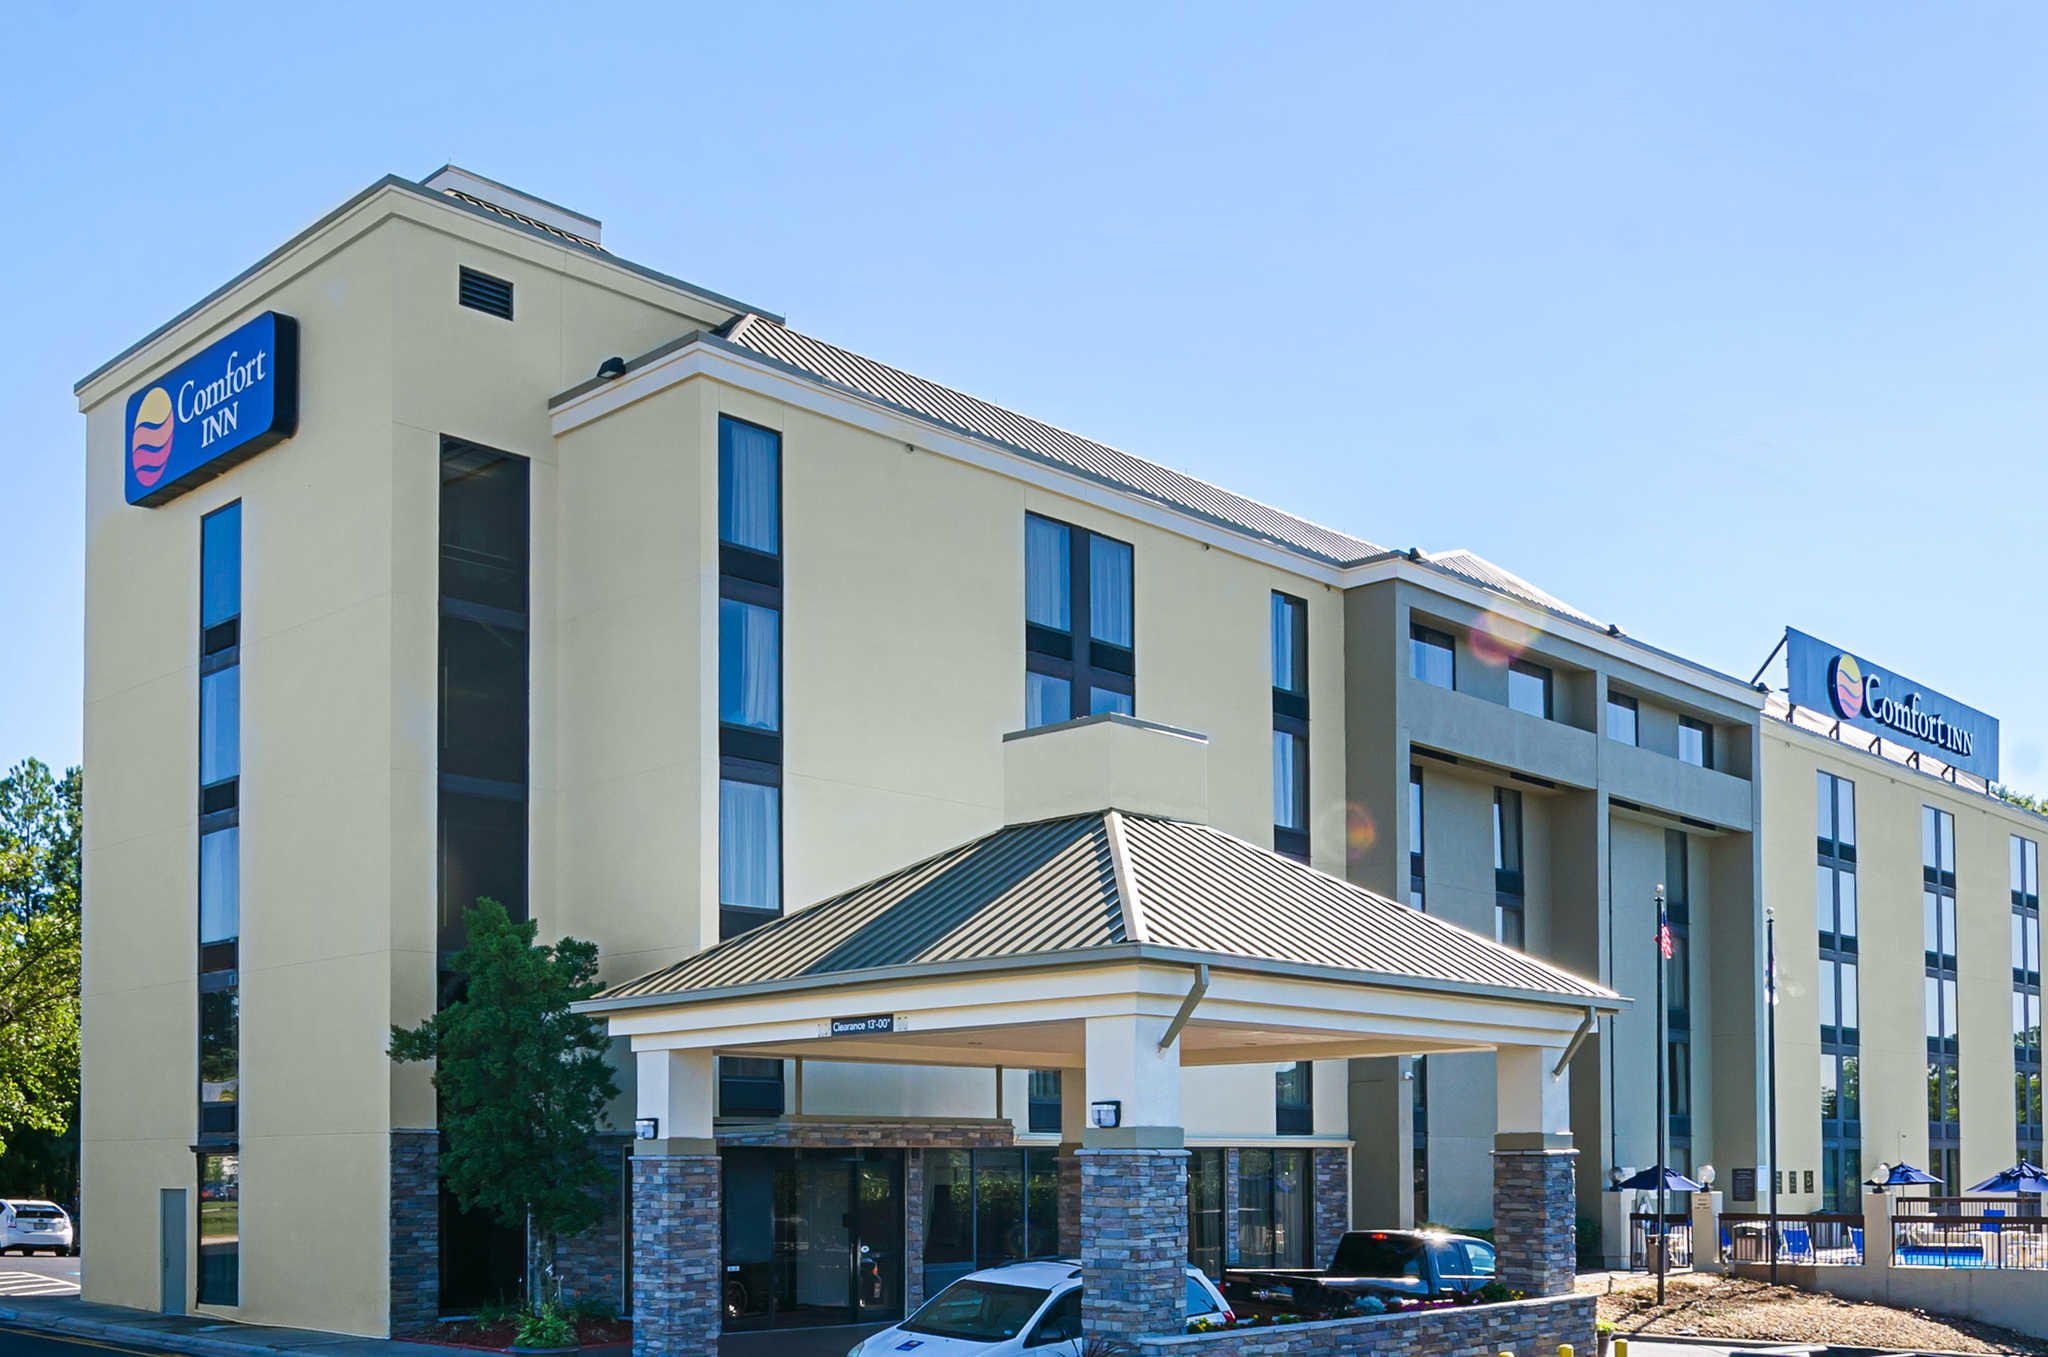 Comfort Inn & Suites Duke University-Downtown image 1